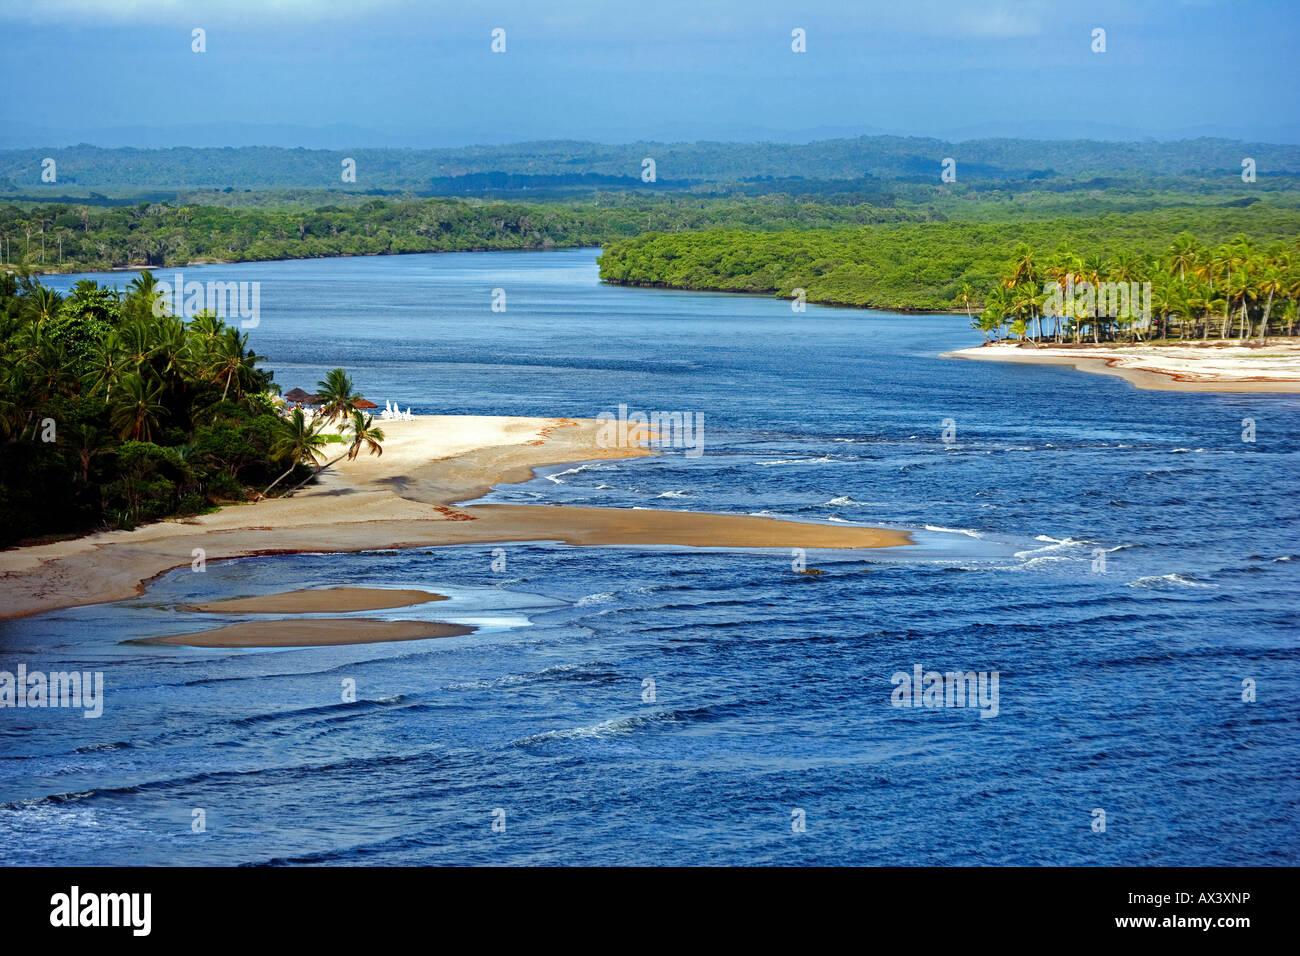 Brazil, Bahia, Boipeba Island. The channel dividing Tinhare and Boipeda on Brazil's Bahian Atlantic coastline from Stock Photo